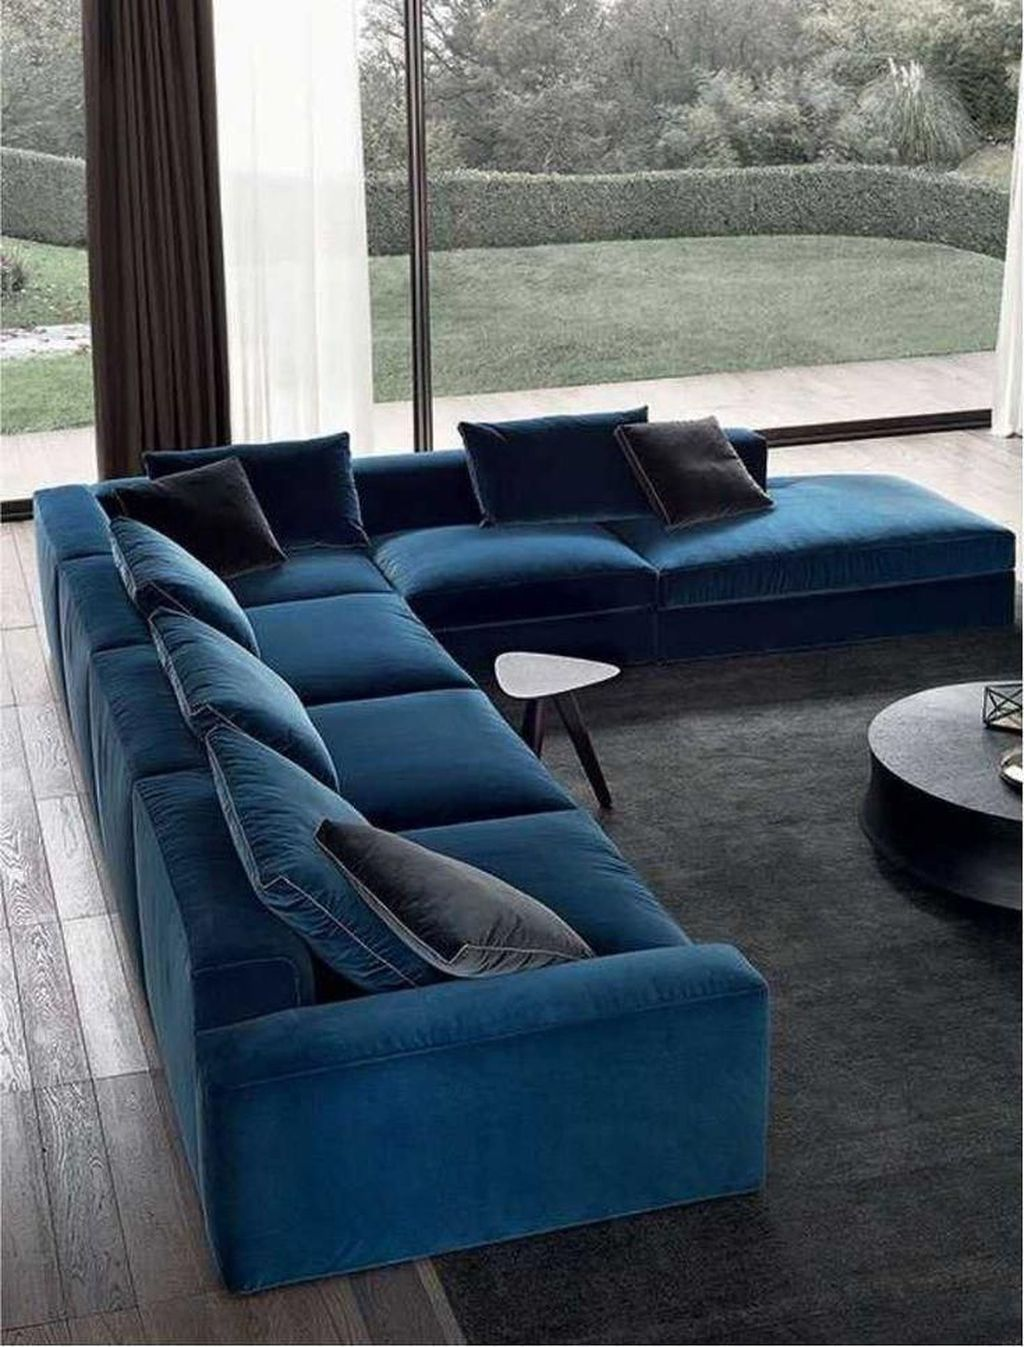 30 Unusual Corner Sofa Ideas That You Can Apply In The Living Room Corner Sofa Design Living Room Sofa Design Living Room Sofa Set